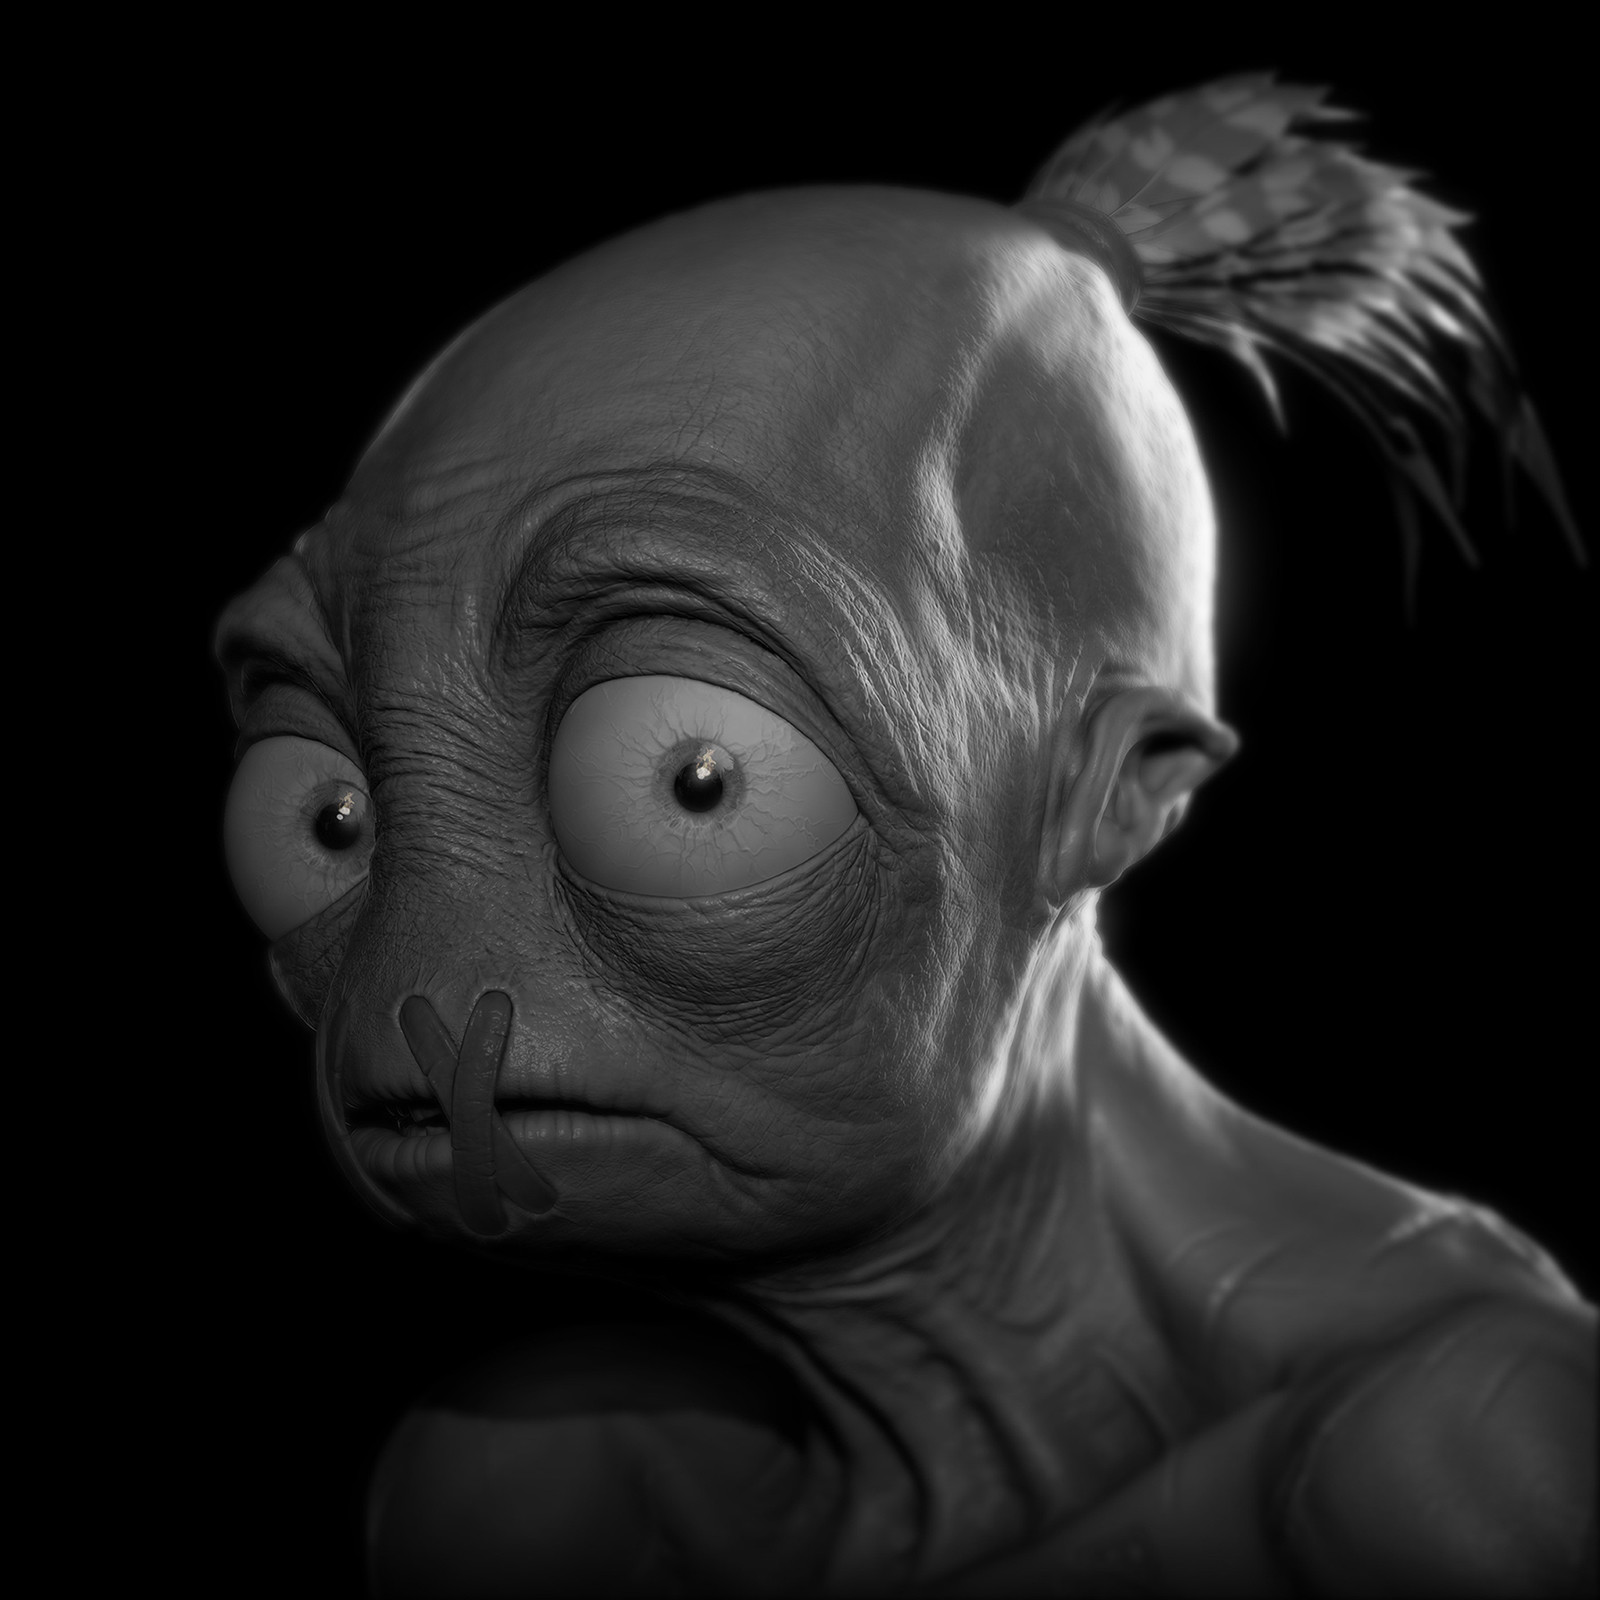 Guillaume lachance oddworld ss face